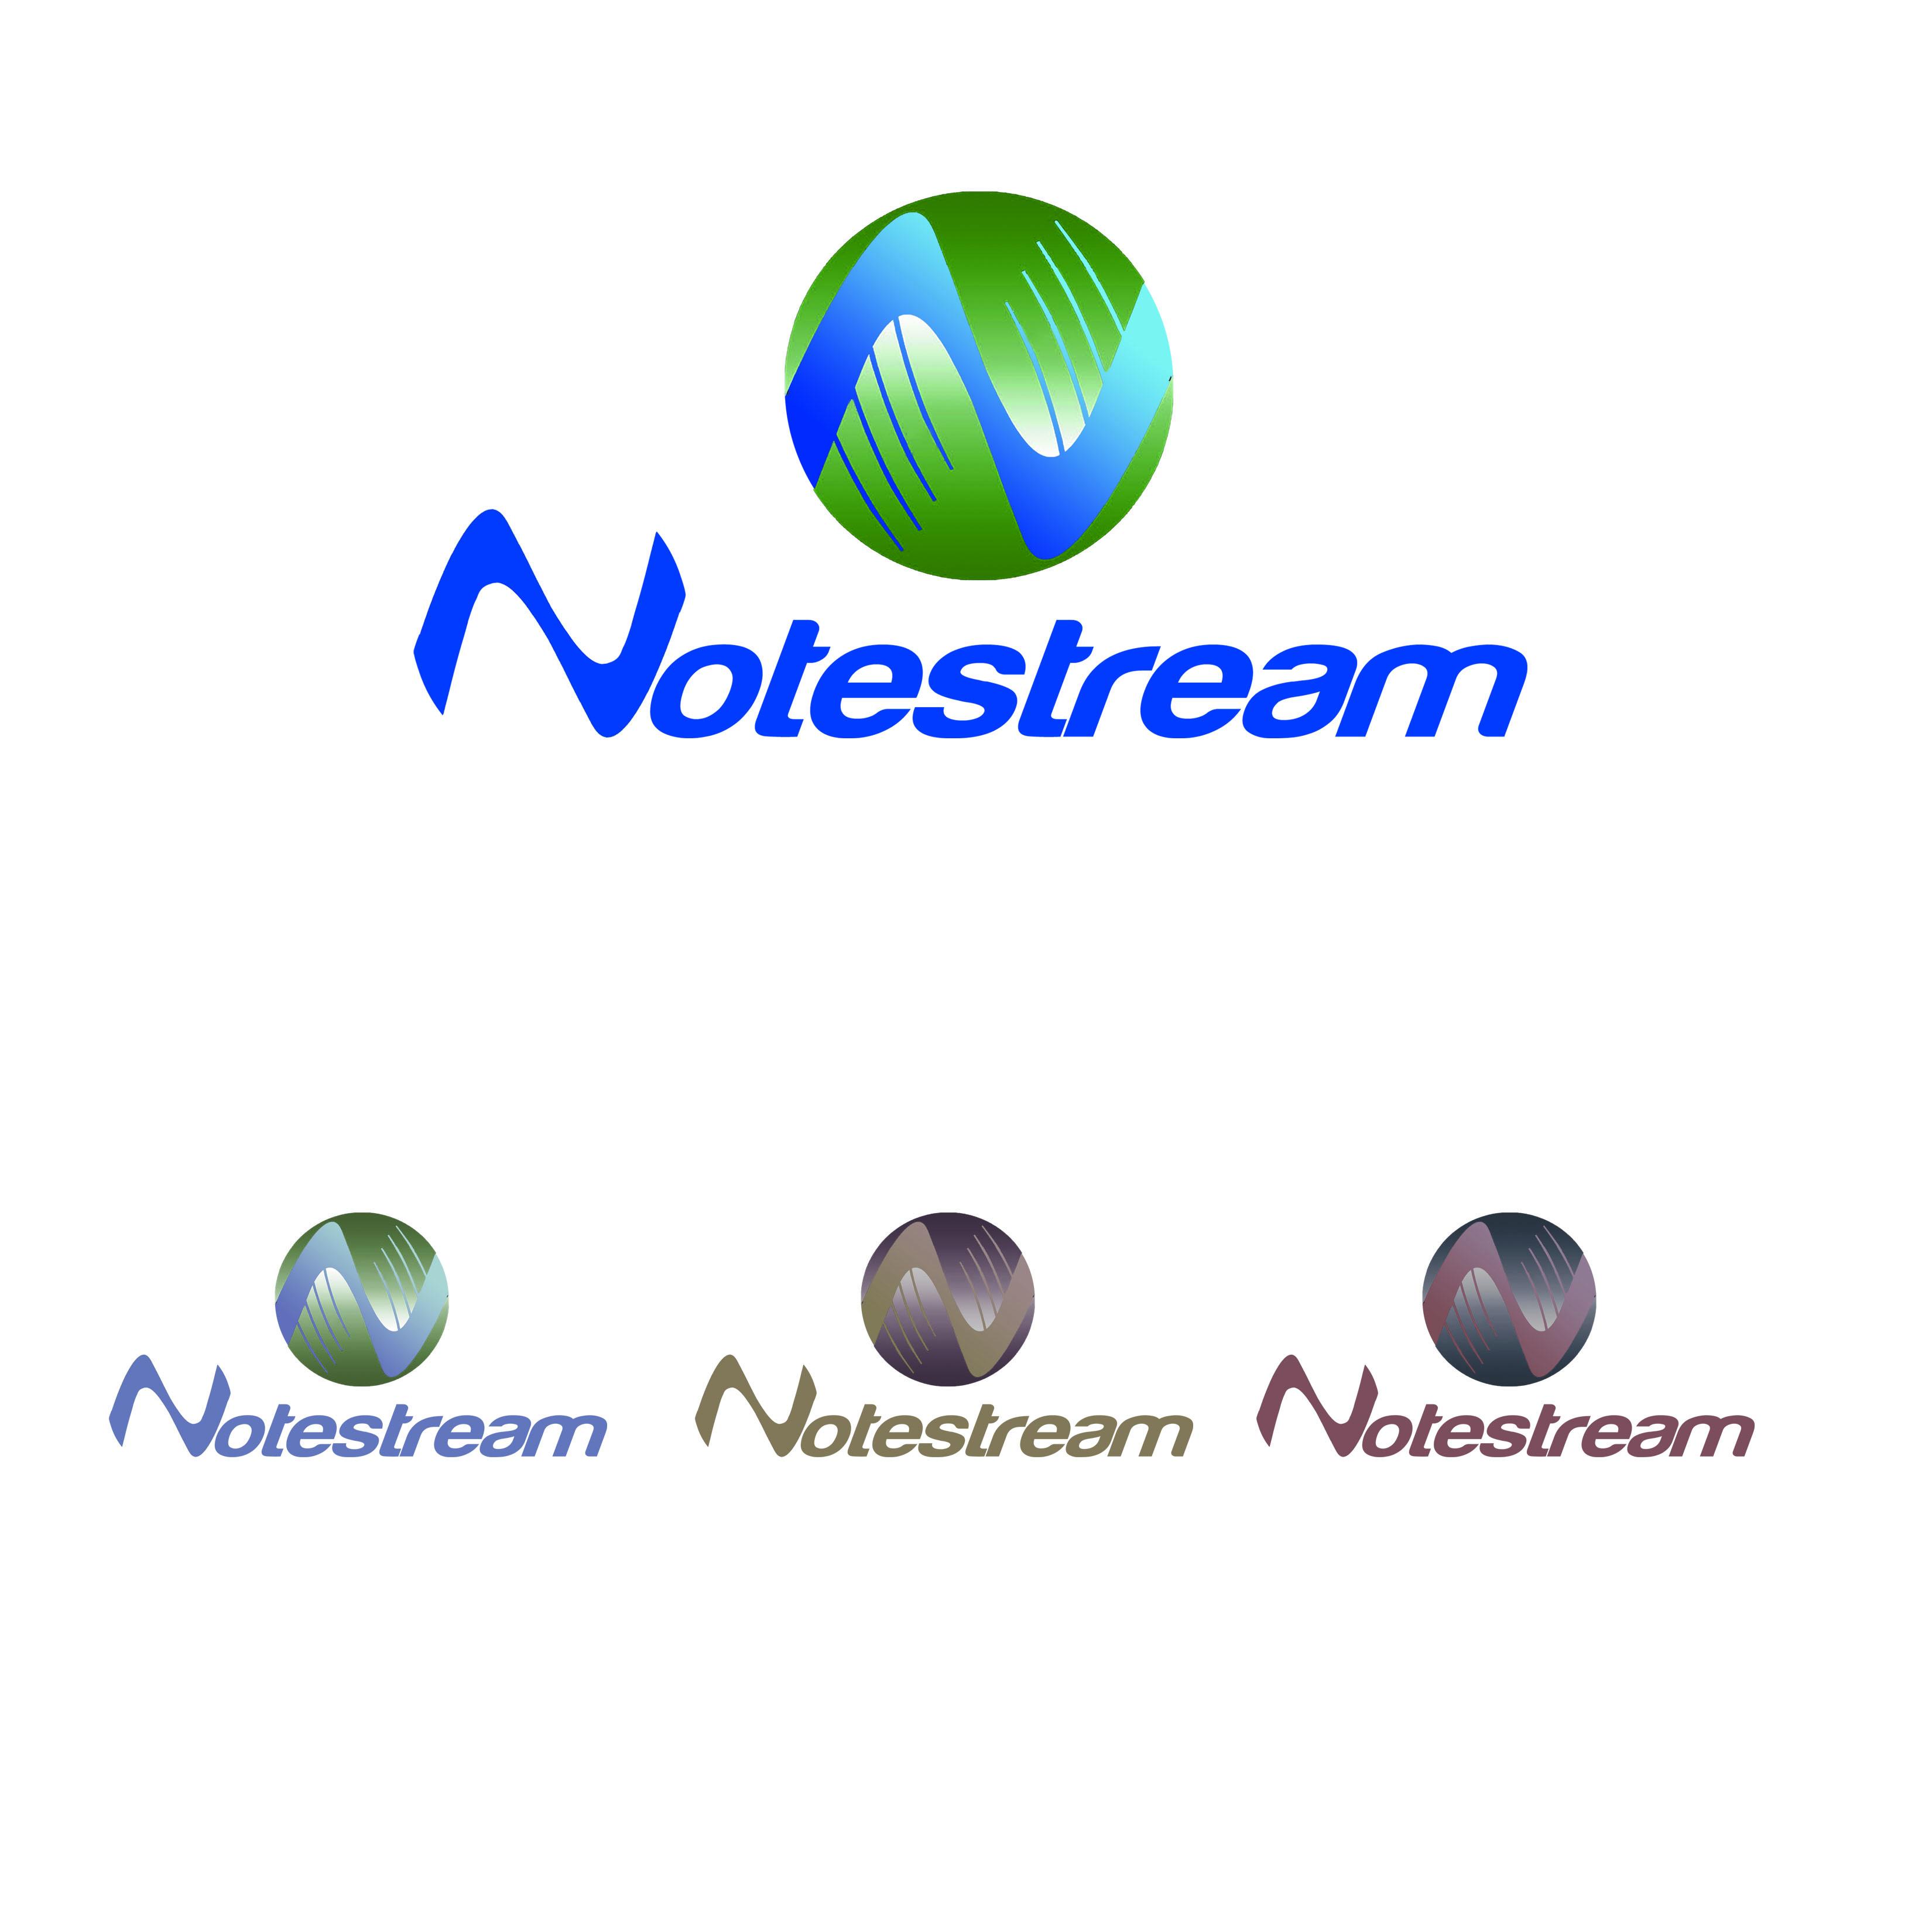 Logo Design by Alan Esclamado - Entry No. 56 in the Logo Design Contest Imaginative Logo Design for NoteStream.